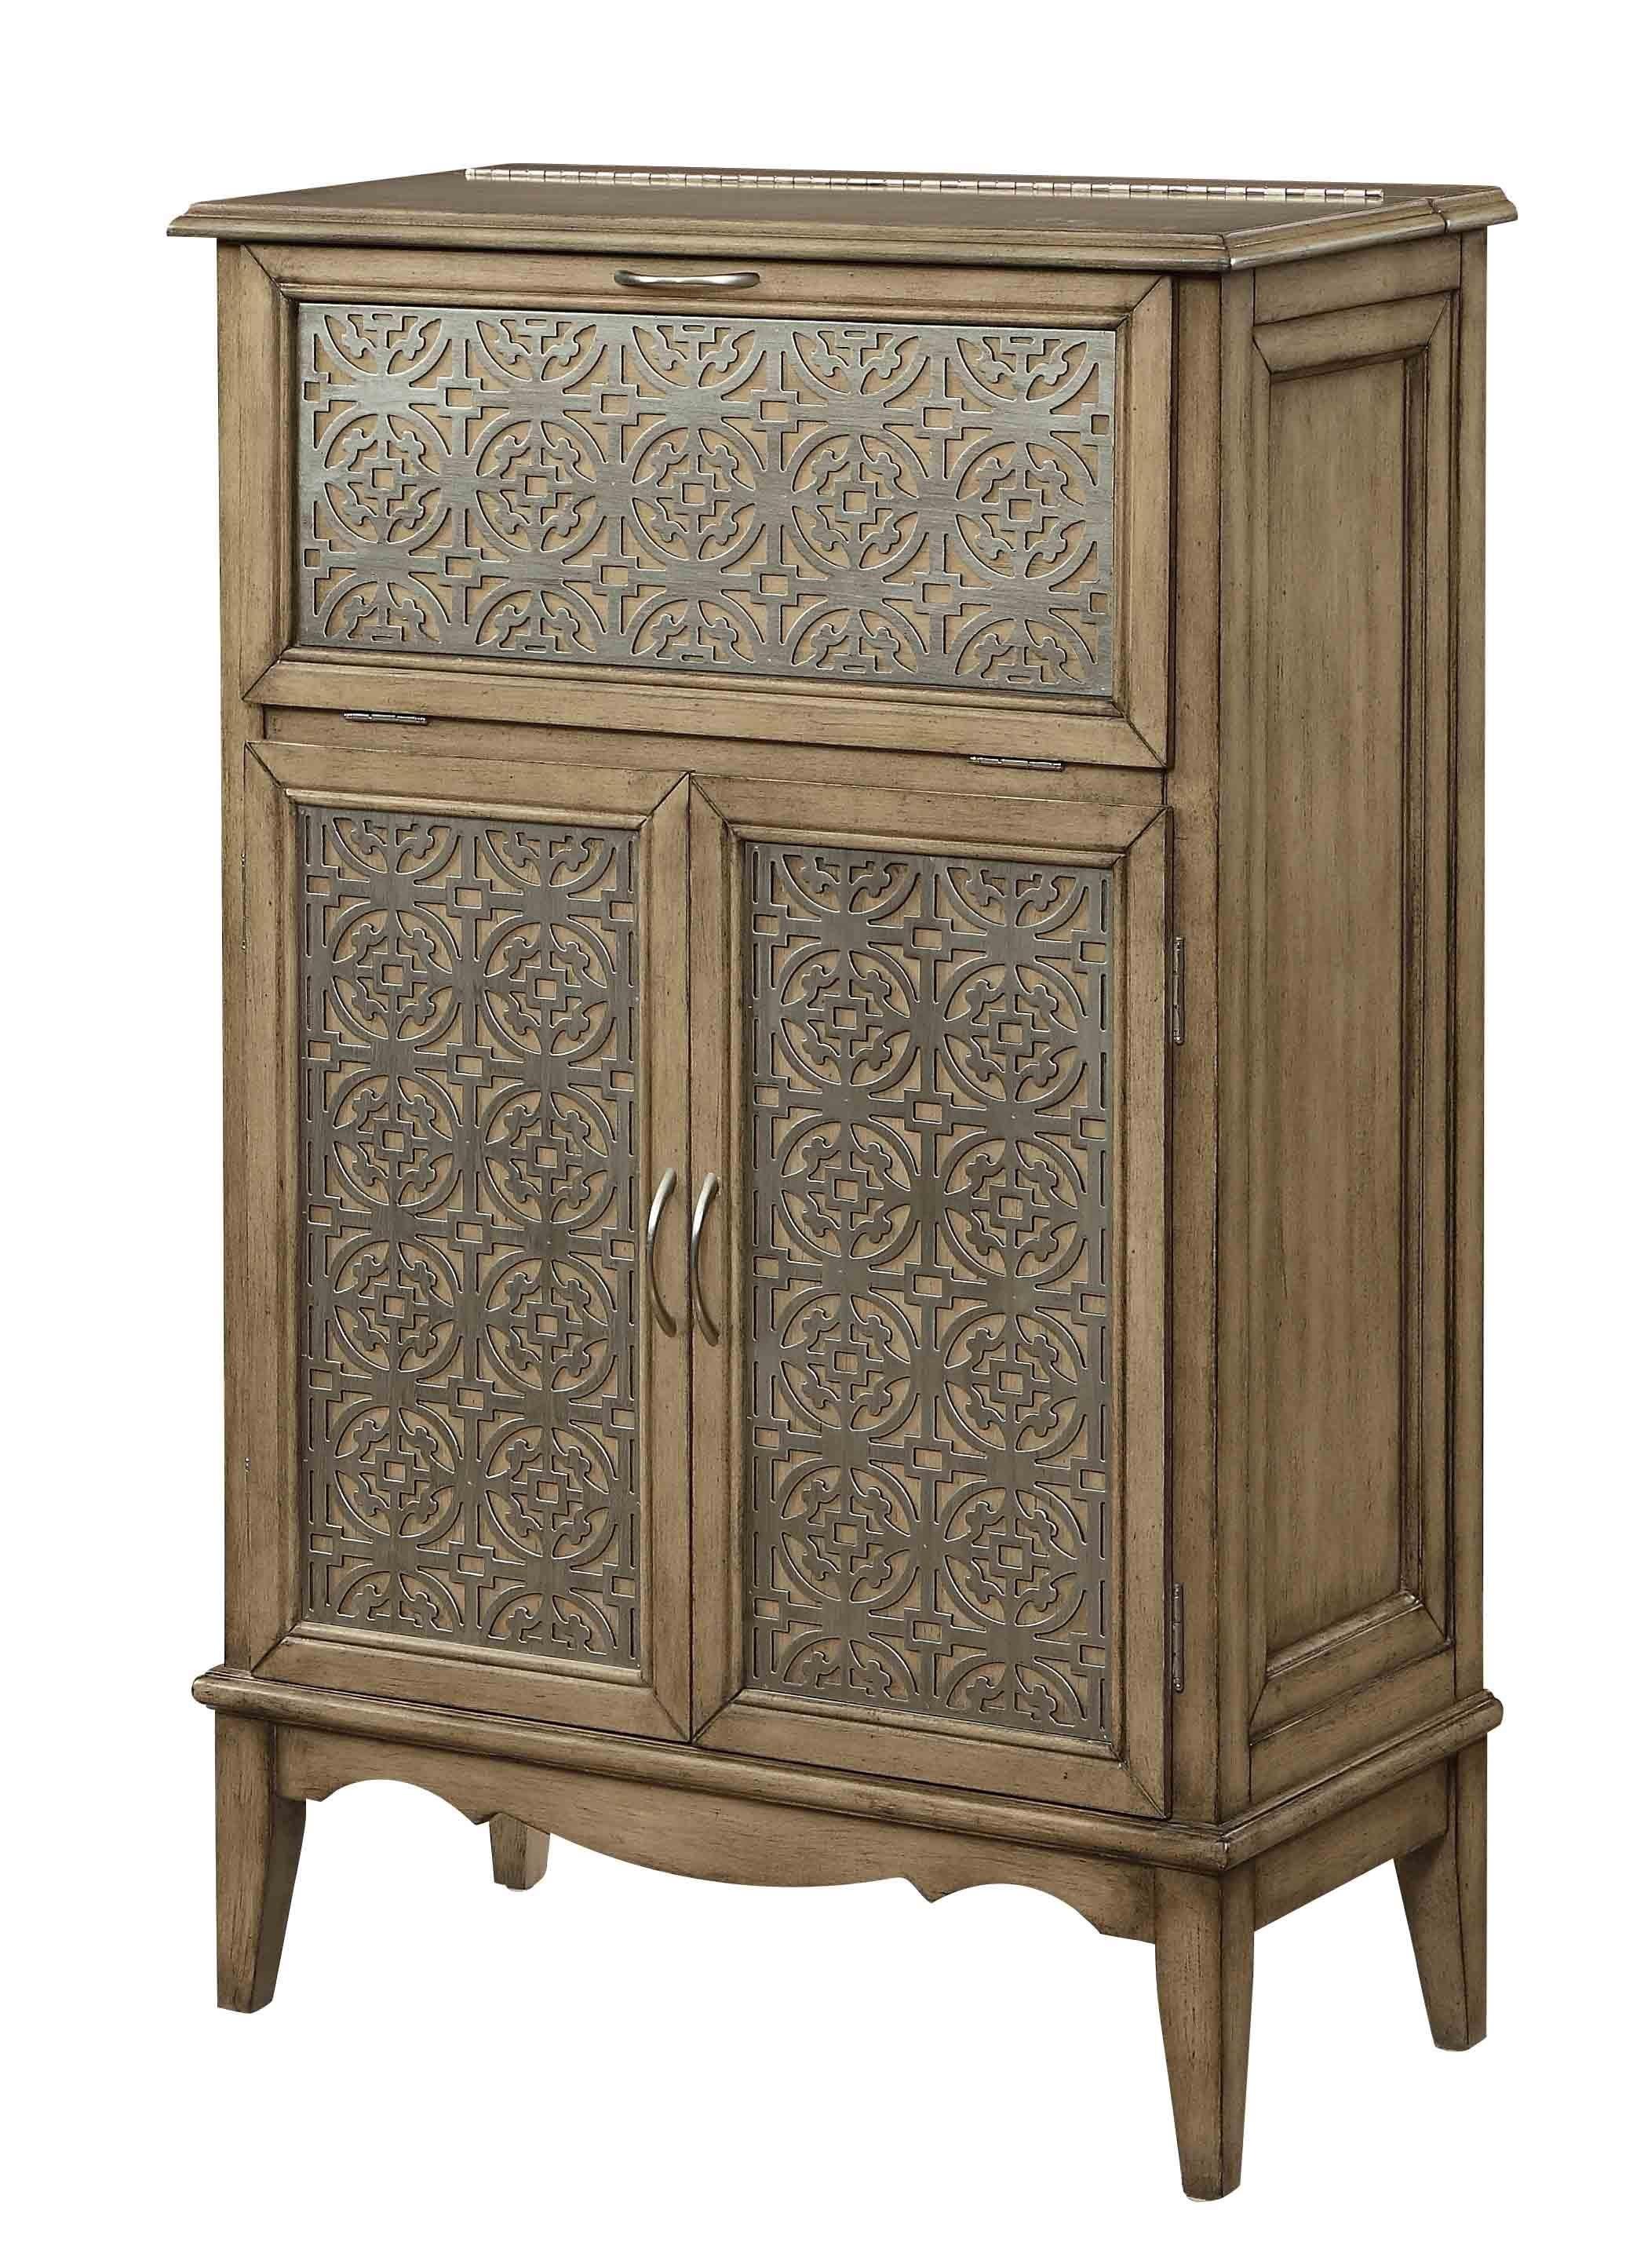 Morris Home Furnishings Marseille Marseille 2 Door Drop Lid Cabinet - Item Number: 923416682